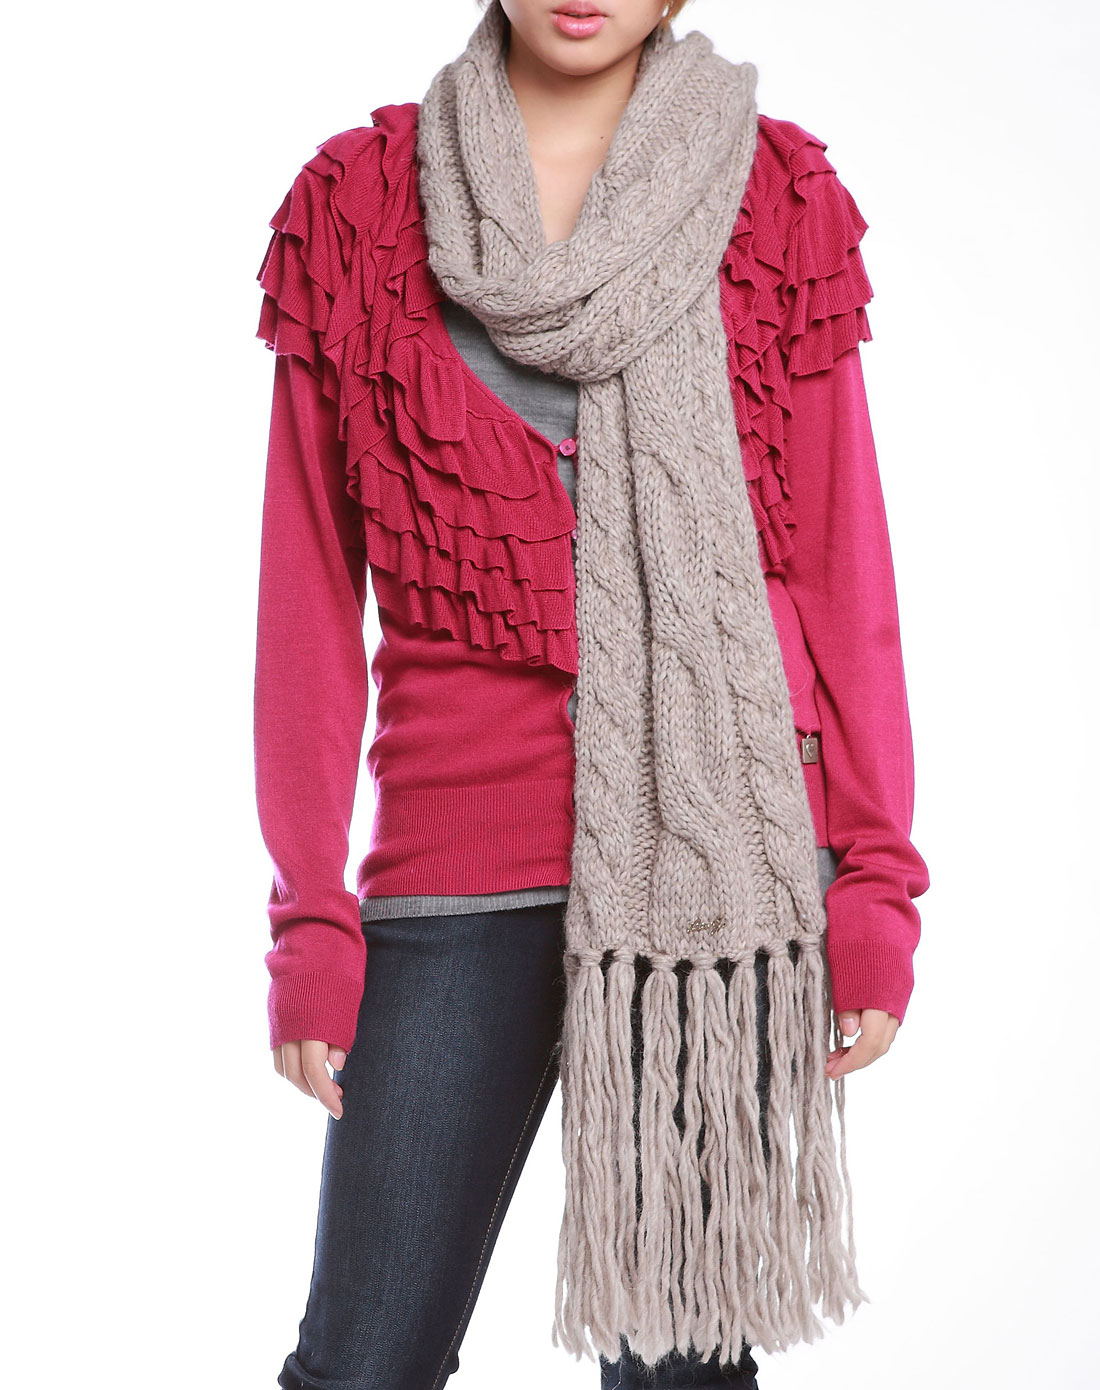 jo米色羊毛混合材质女式围巾